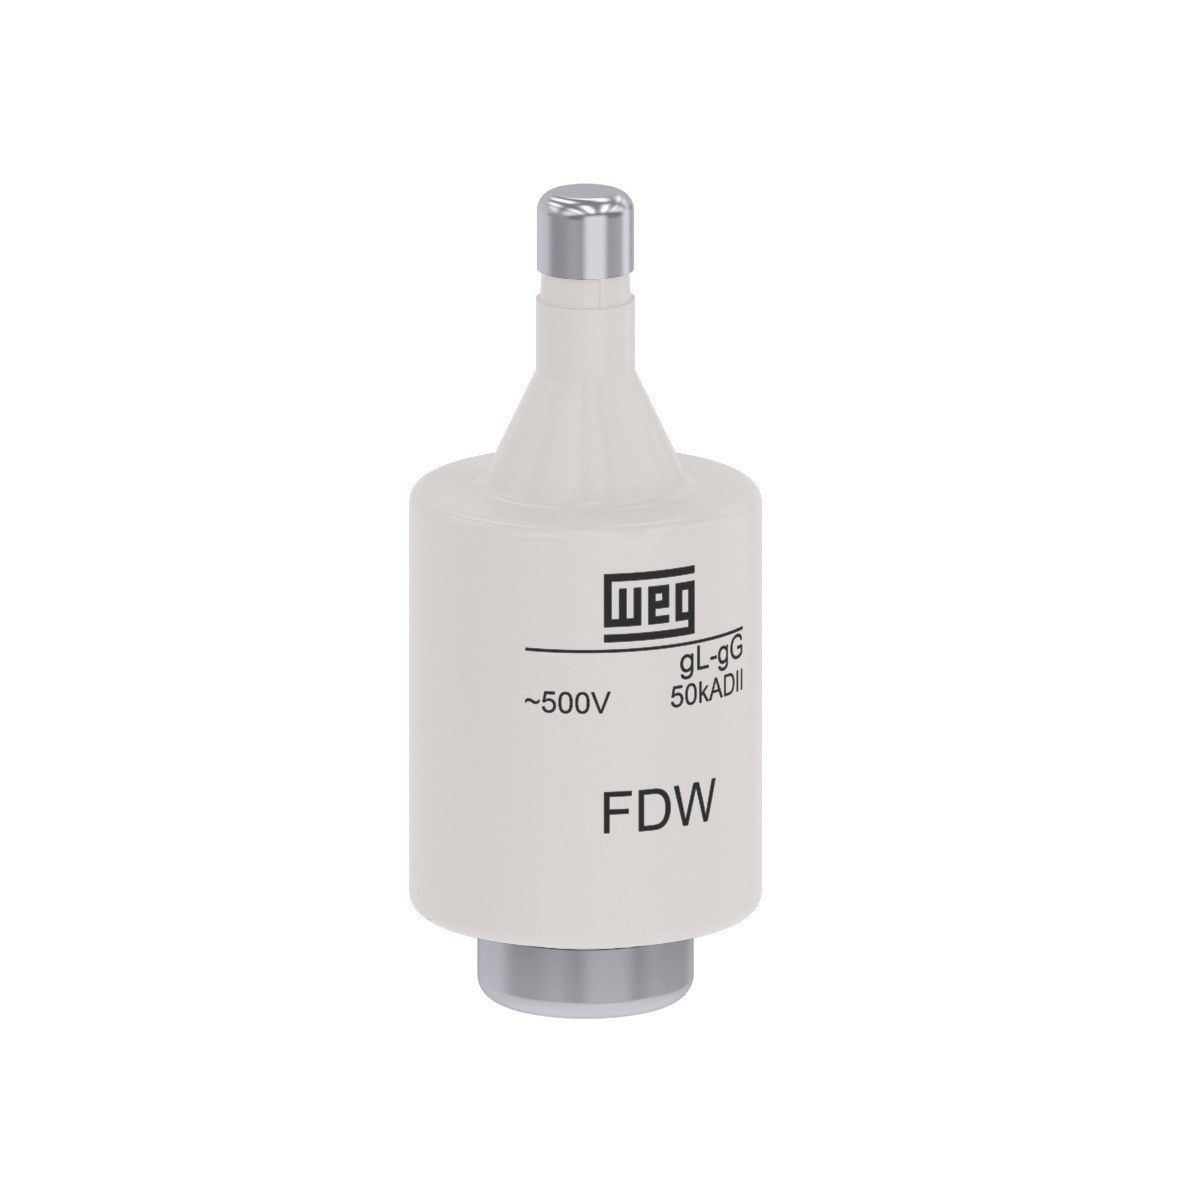 Fusivel Diazed D II 4A gGgL FDW 4 - Weg